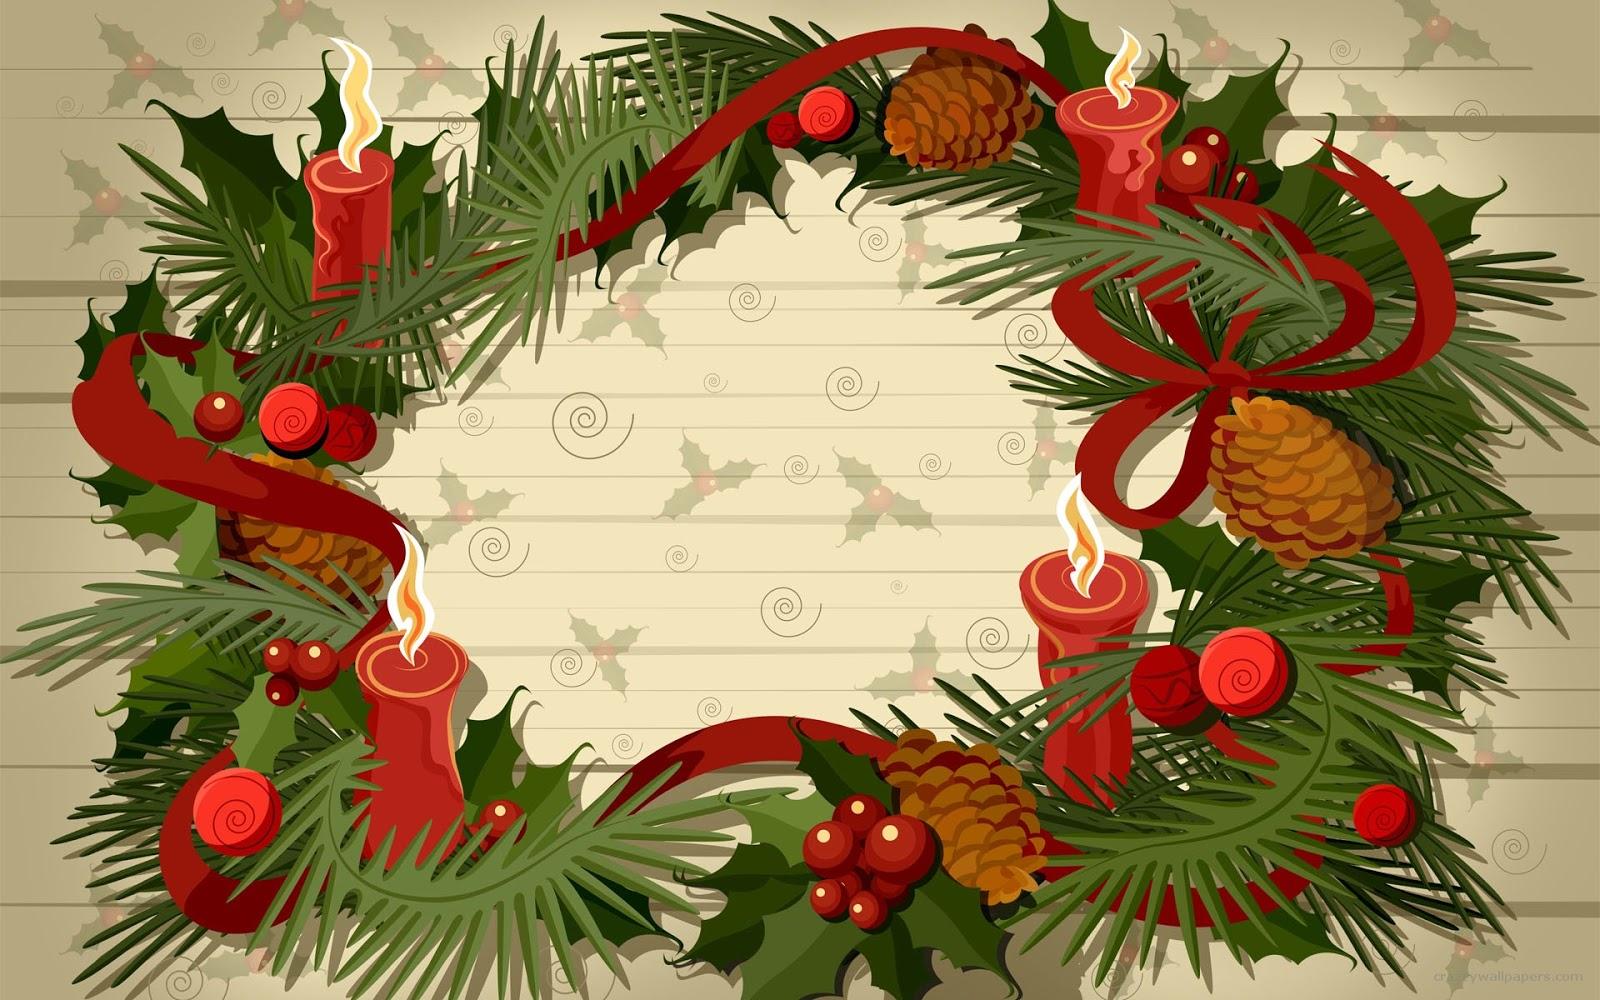 45 Merry <b>Christmas</b> Jingle Bells <b>Wallpapers</b>, HD Creative Merry ...